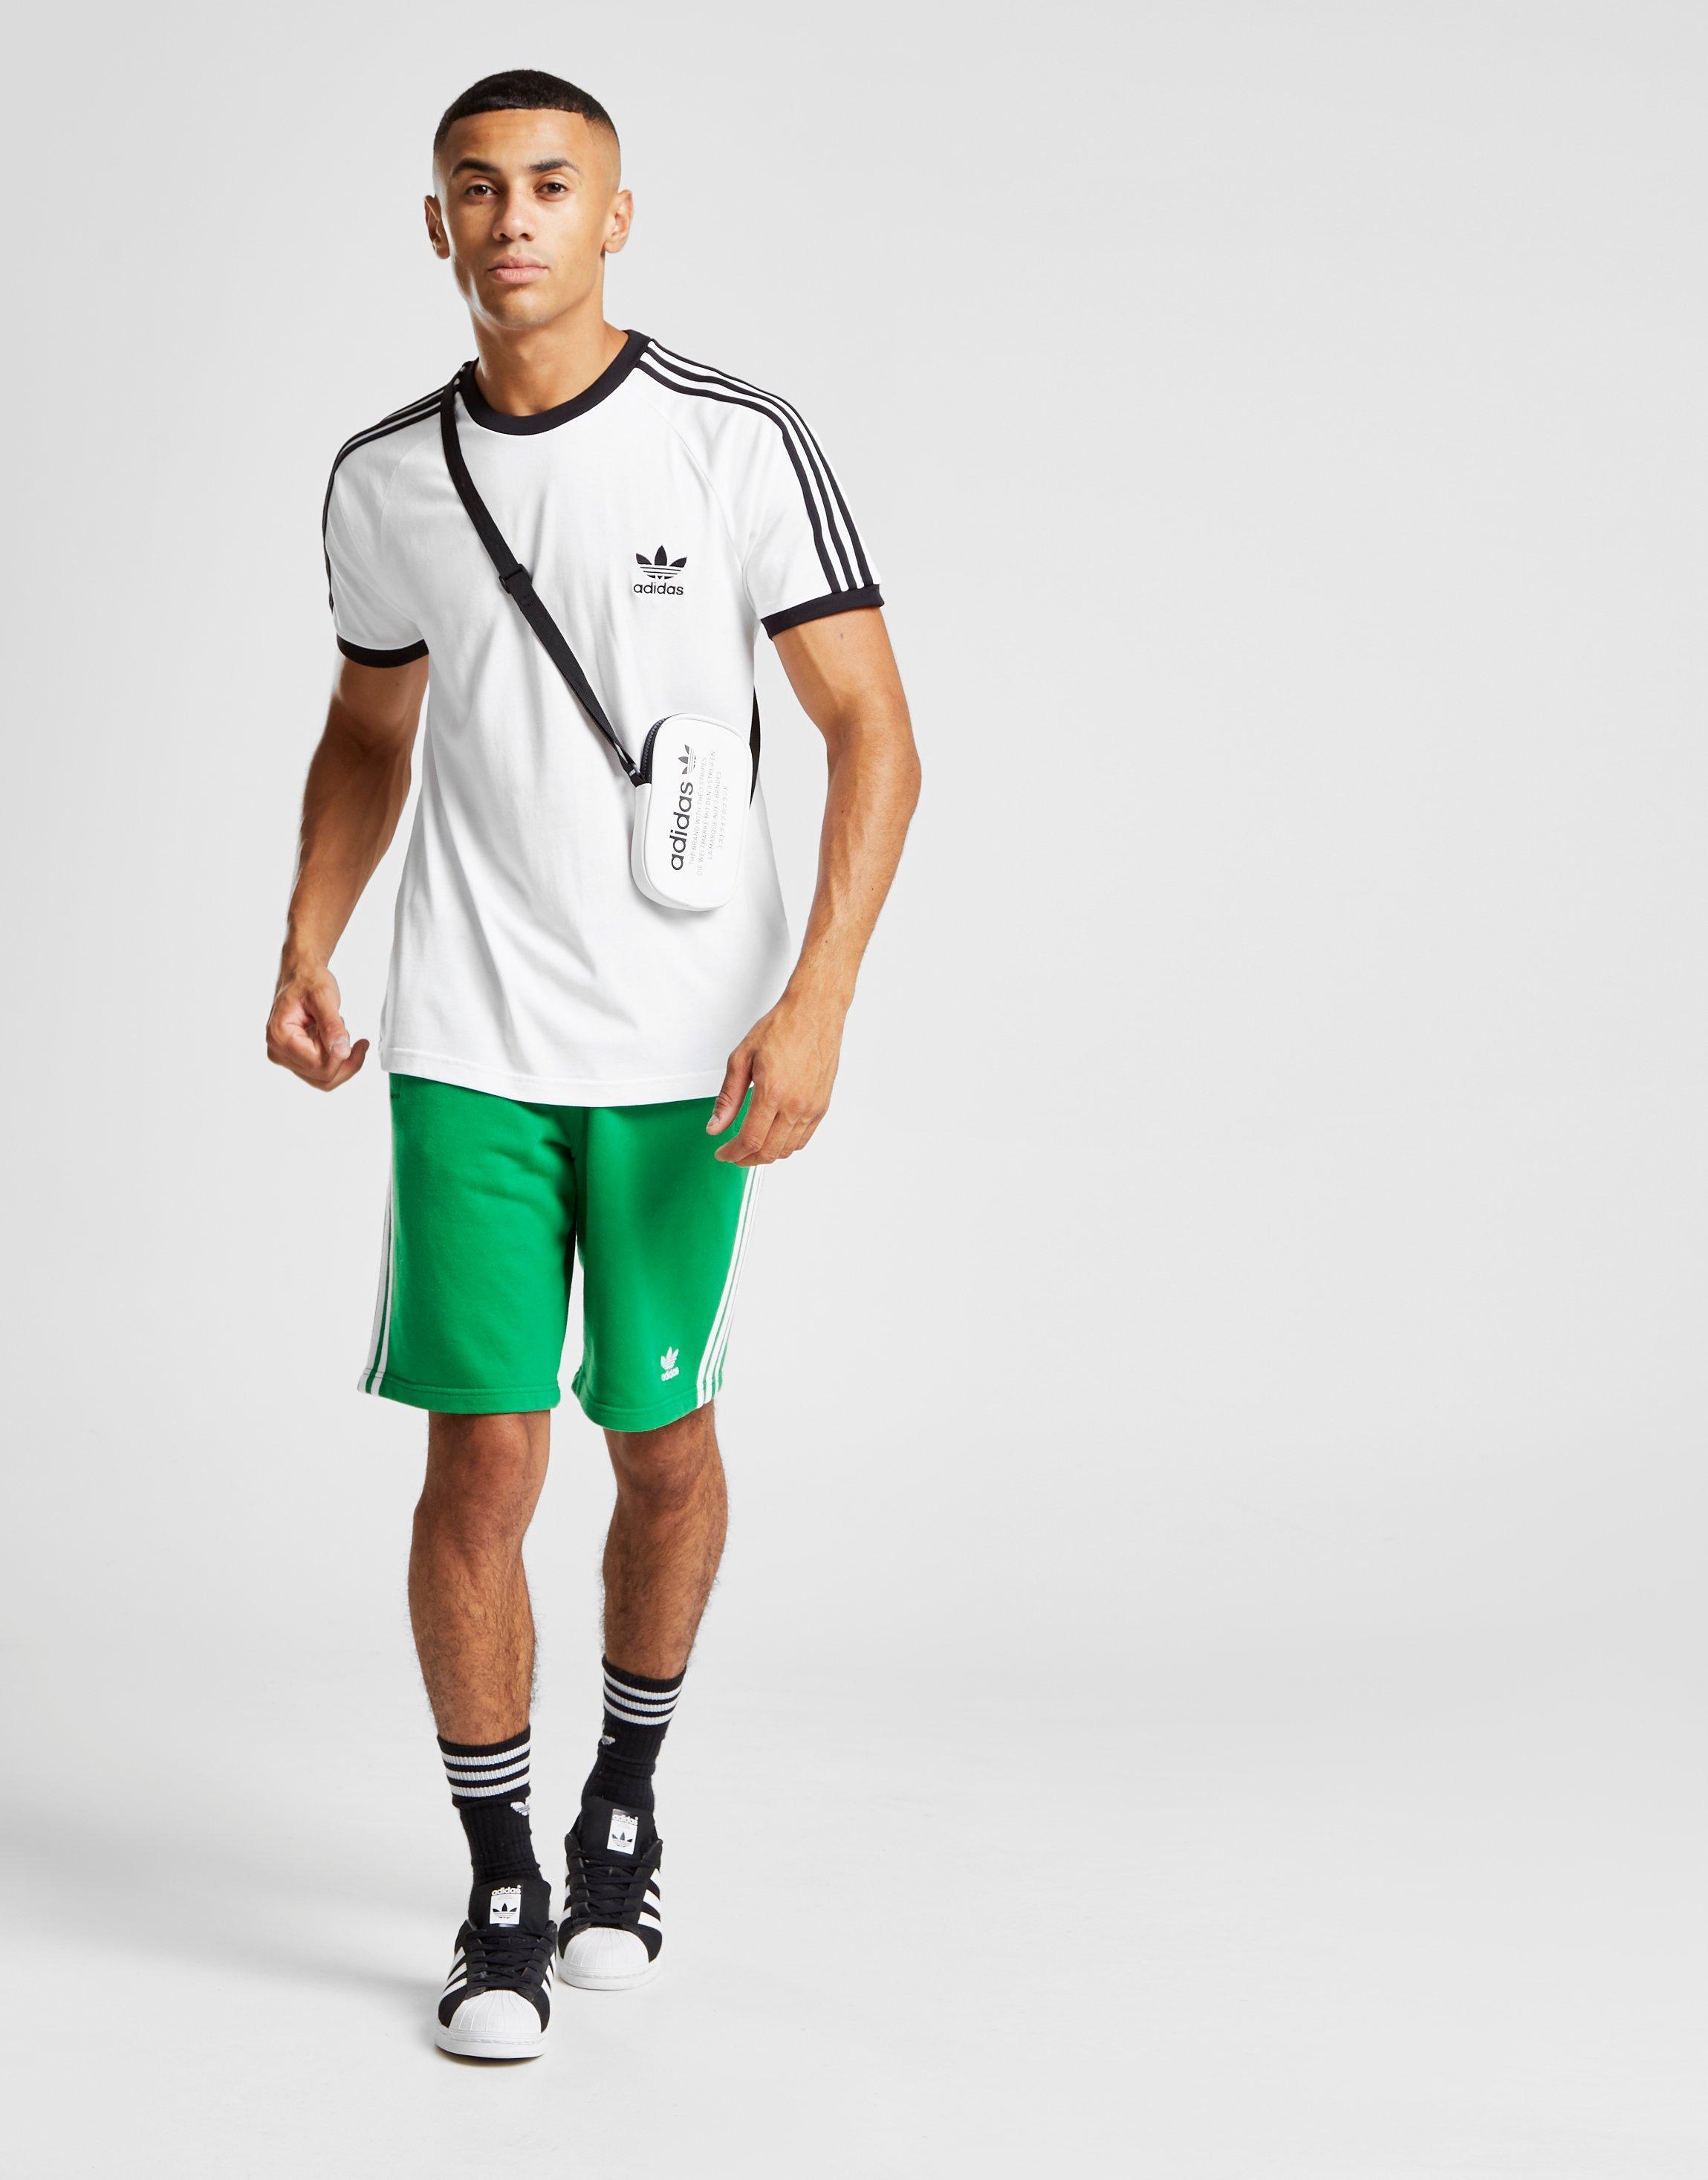 b7b9dd66210 Lyst - Adidas Originals 3-stripes California Short Sleeve T-shirt in ...